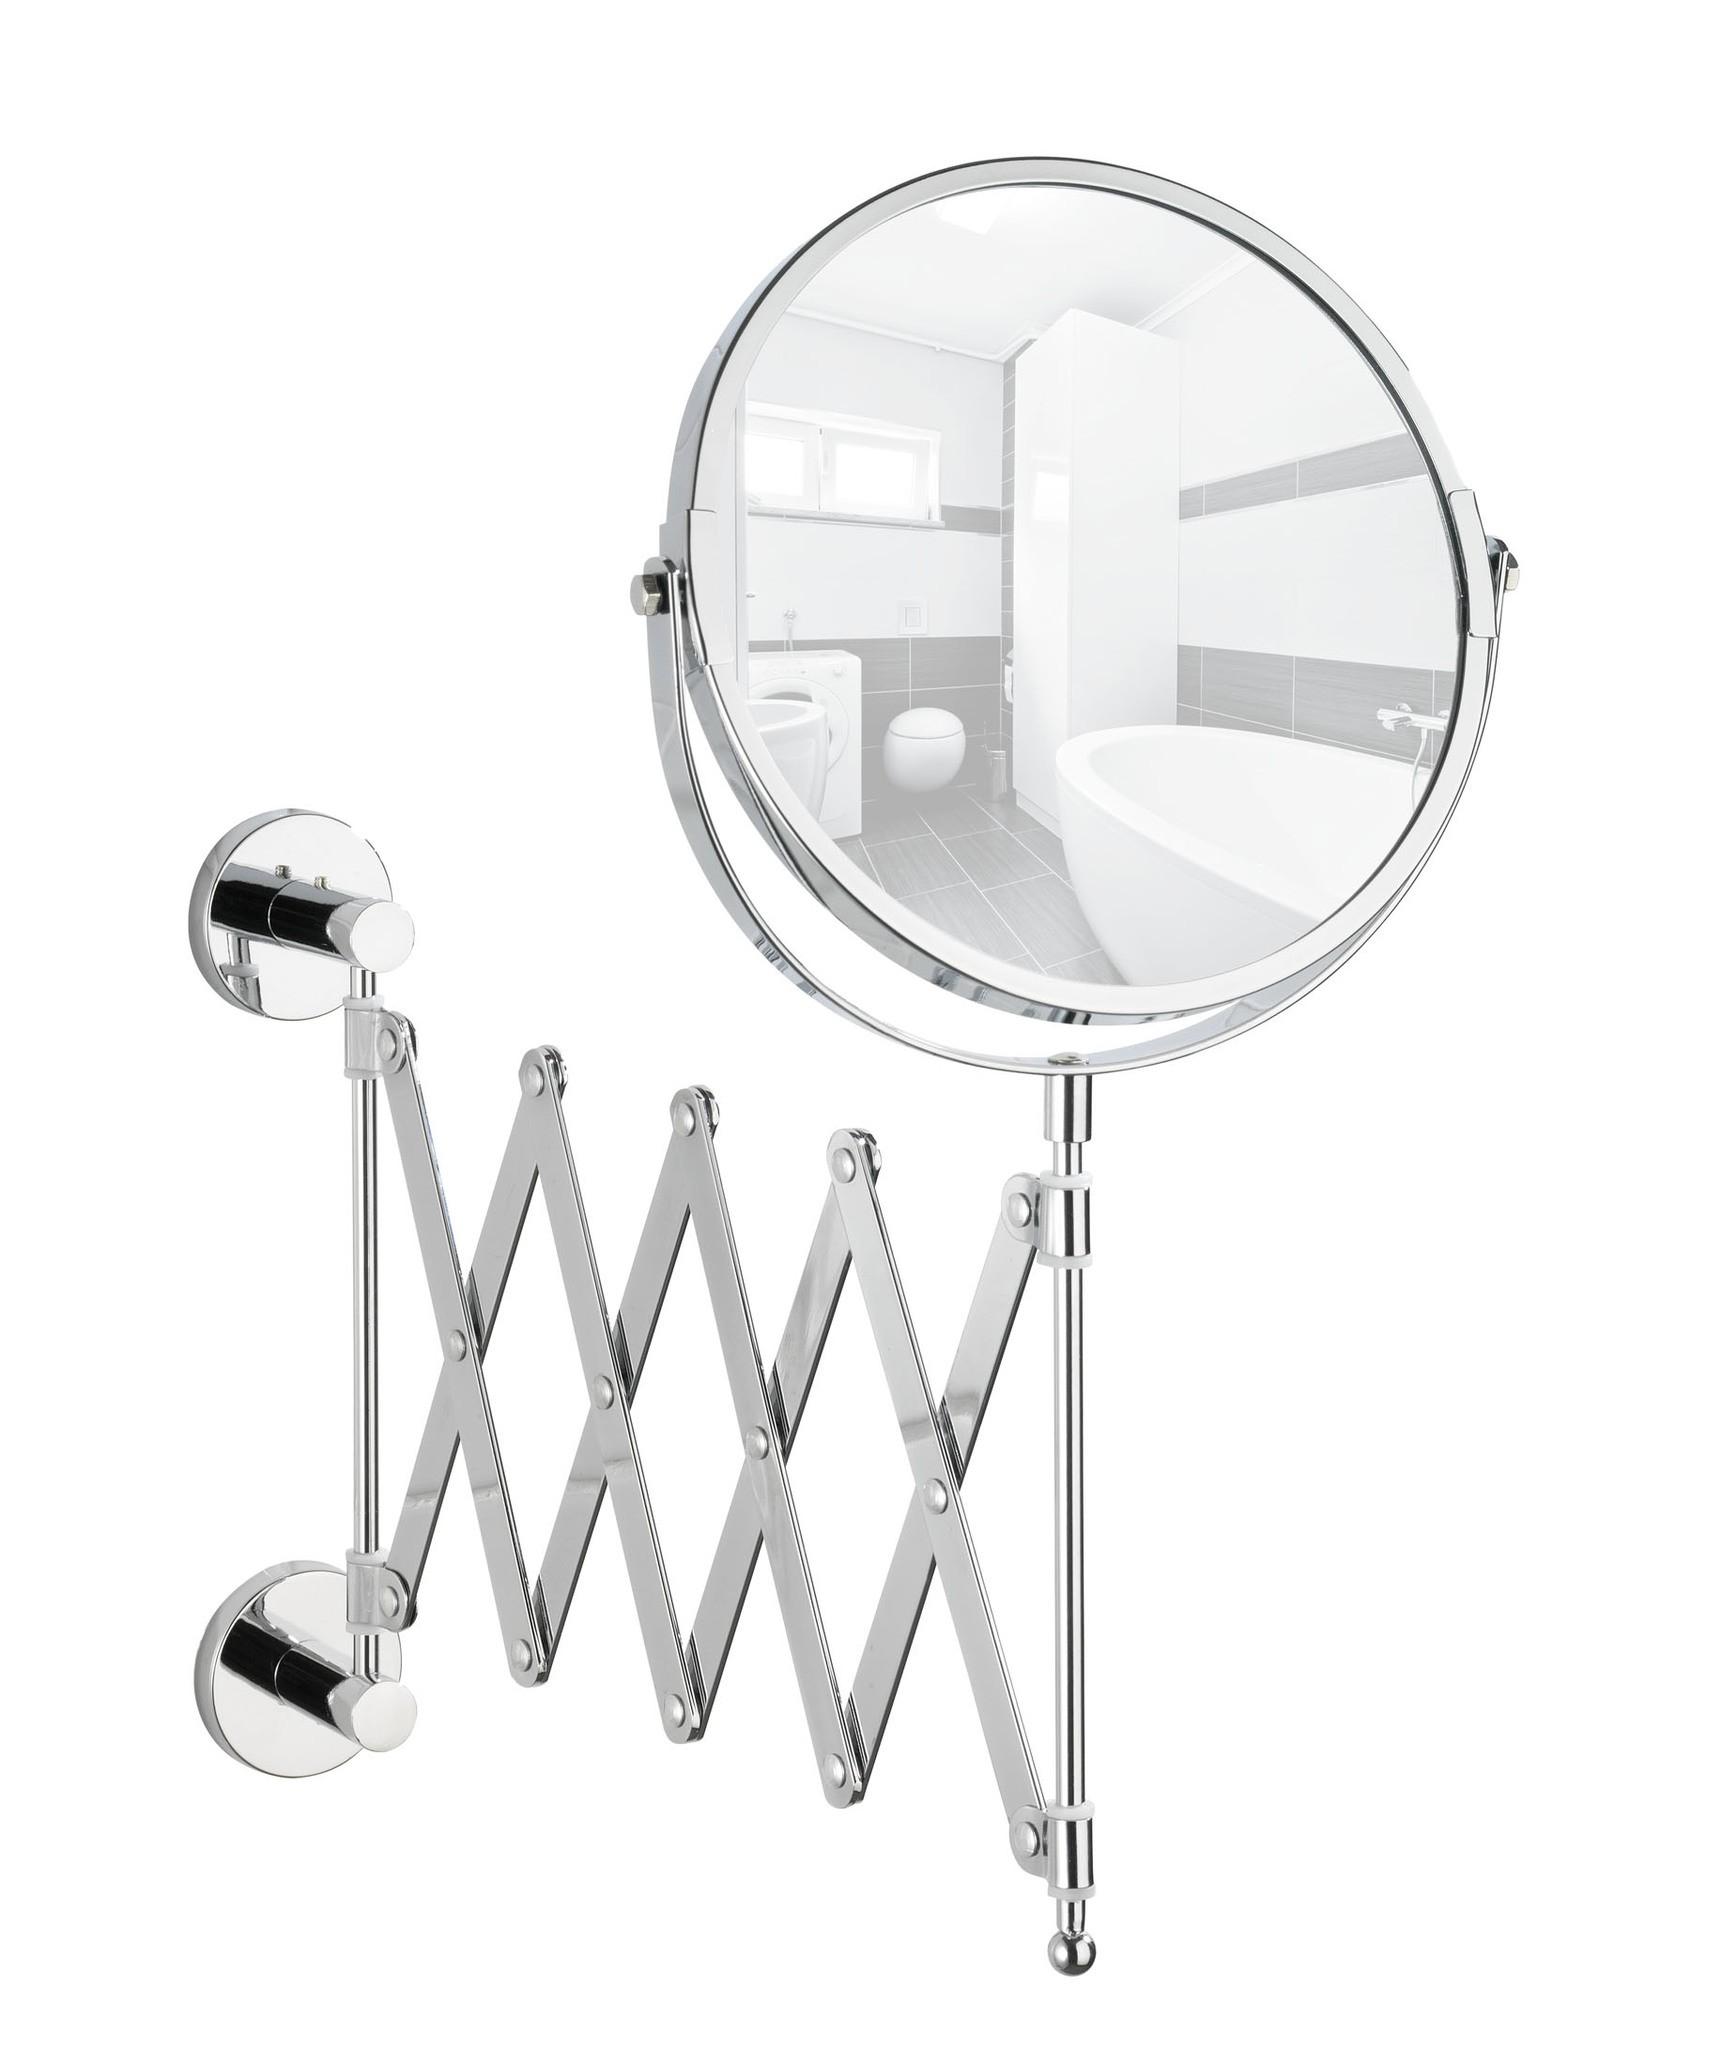 Power-Loc Teleskop Kosmetikspiegel Elegance, Befestigen ohne bohren